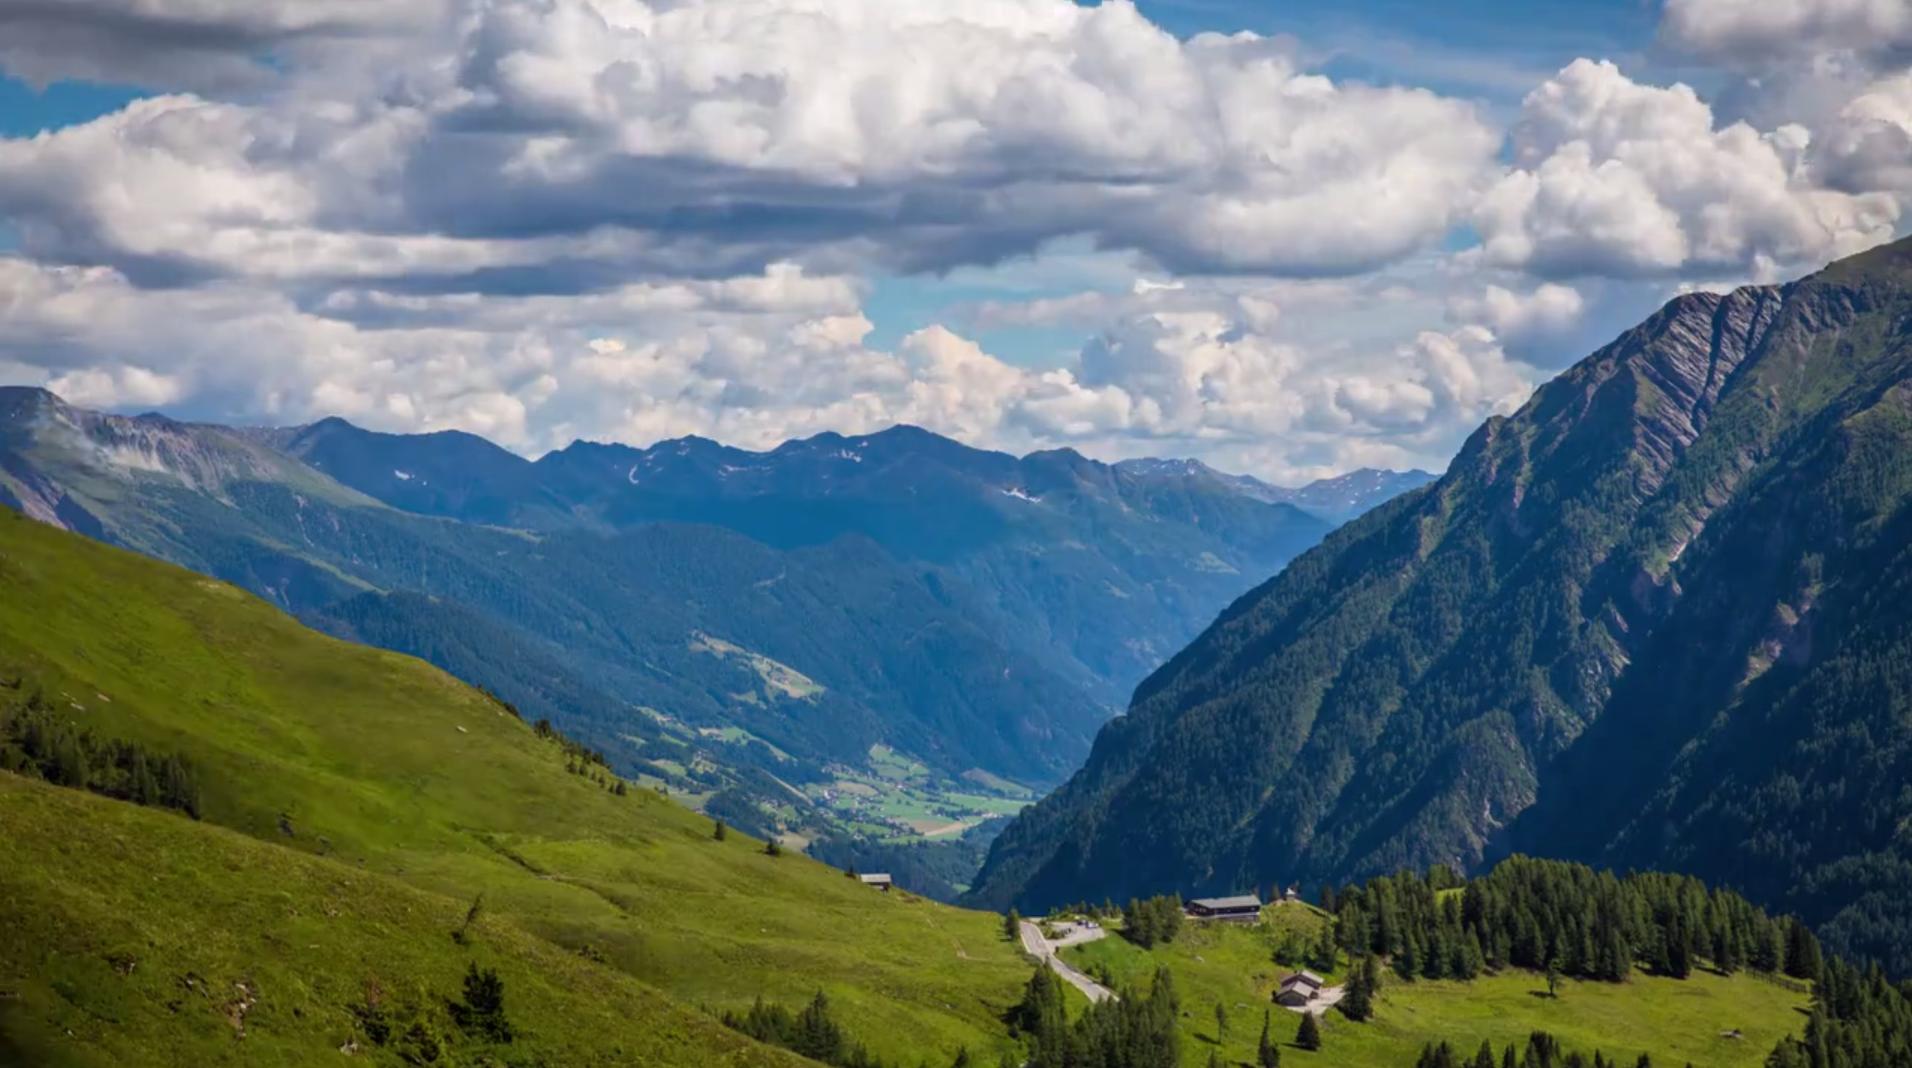 A taste of Austria by FilmSpektakel 6